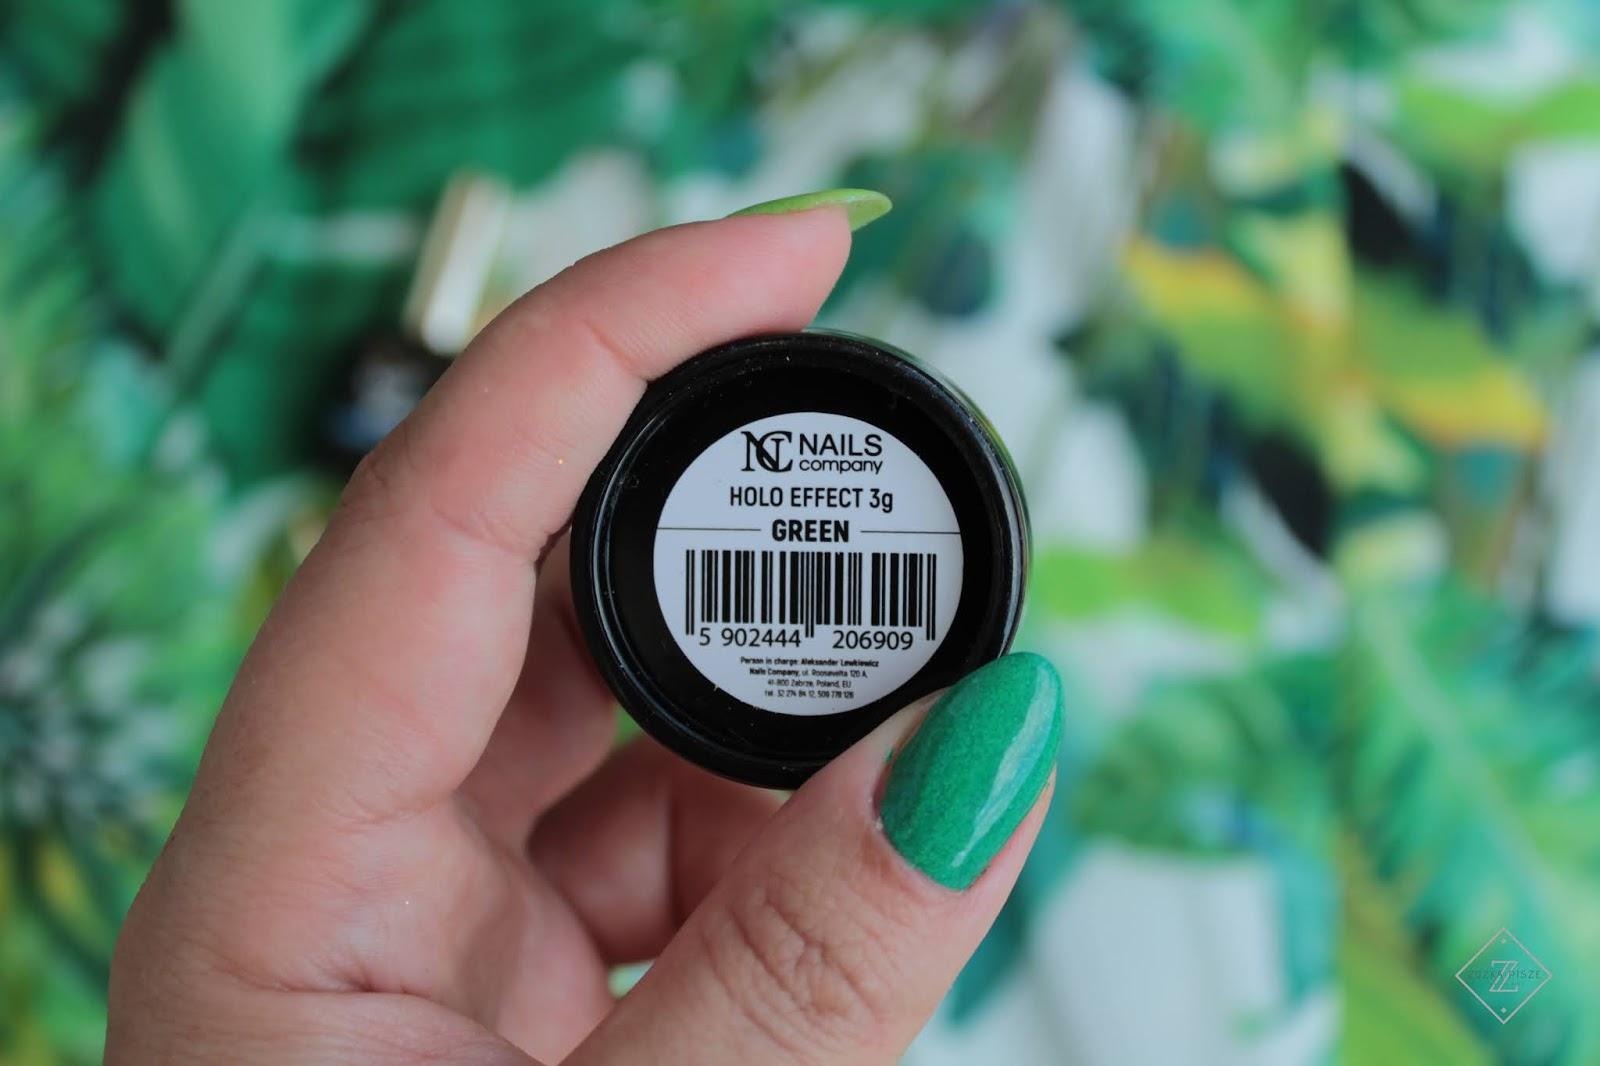 Pyłek NC Nails Company HOLO GREEN